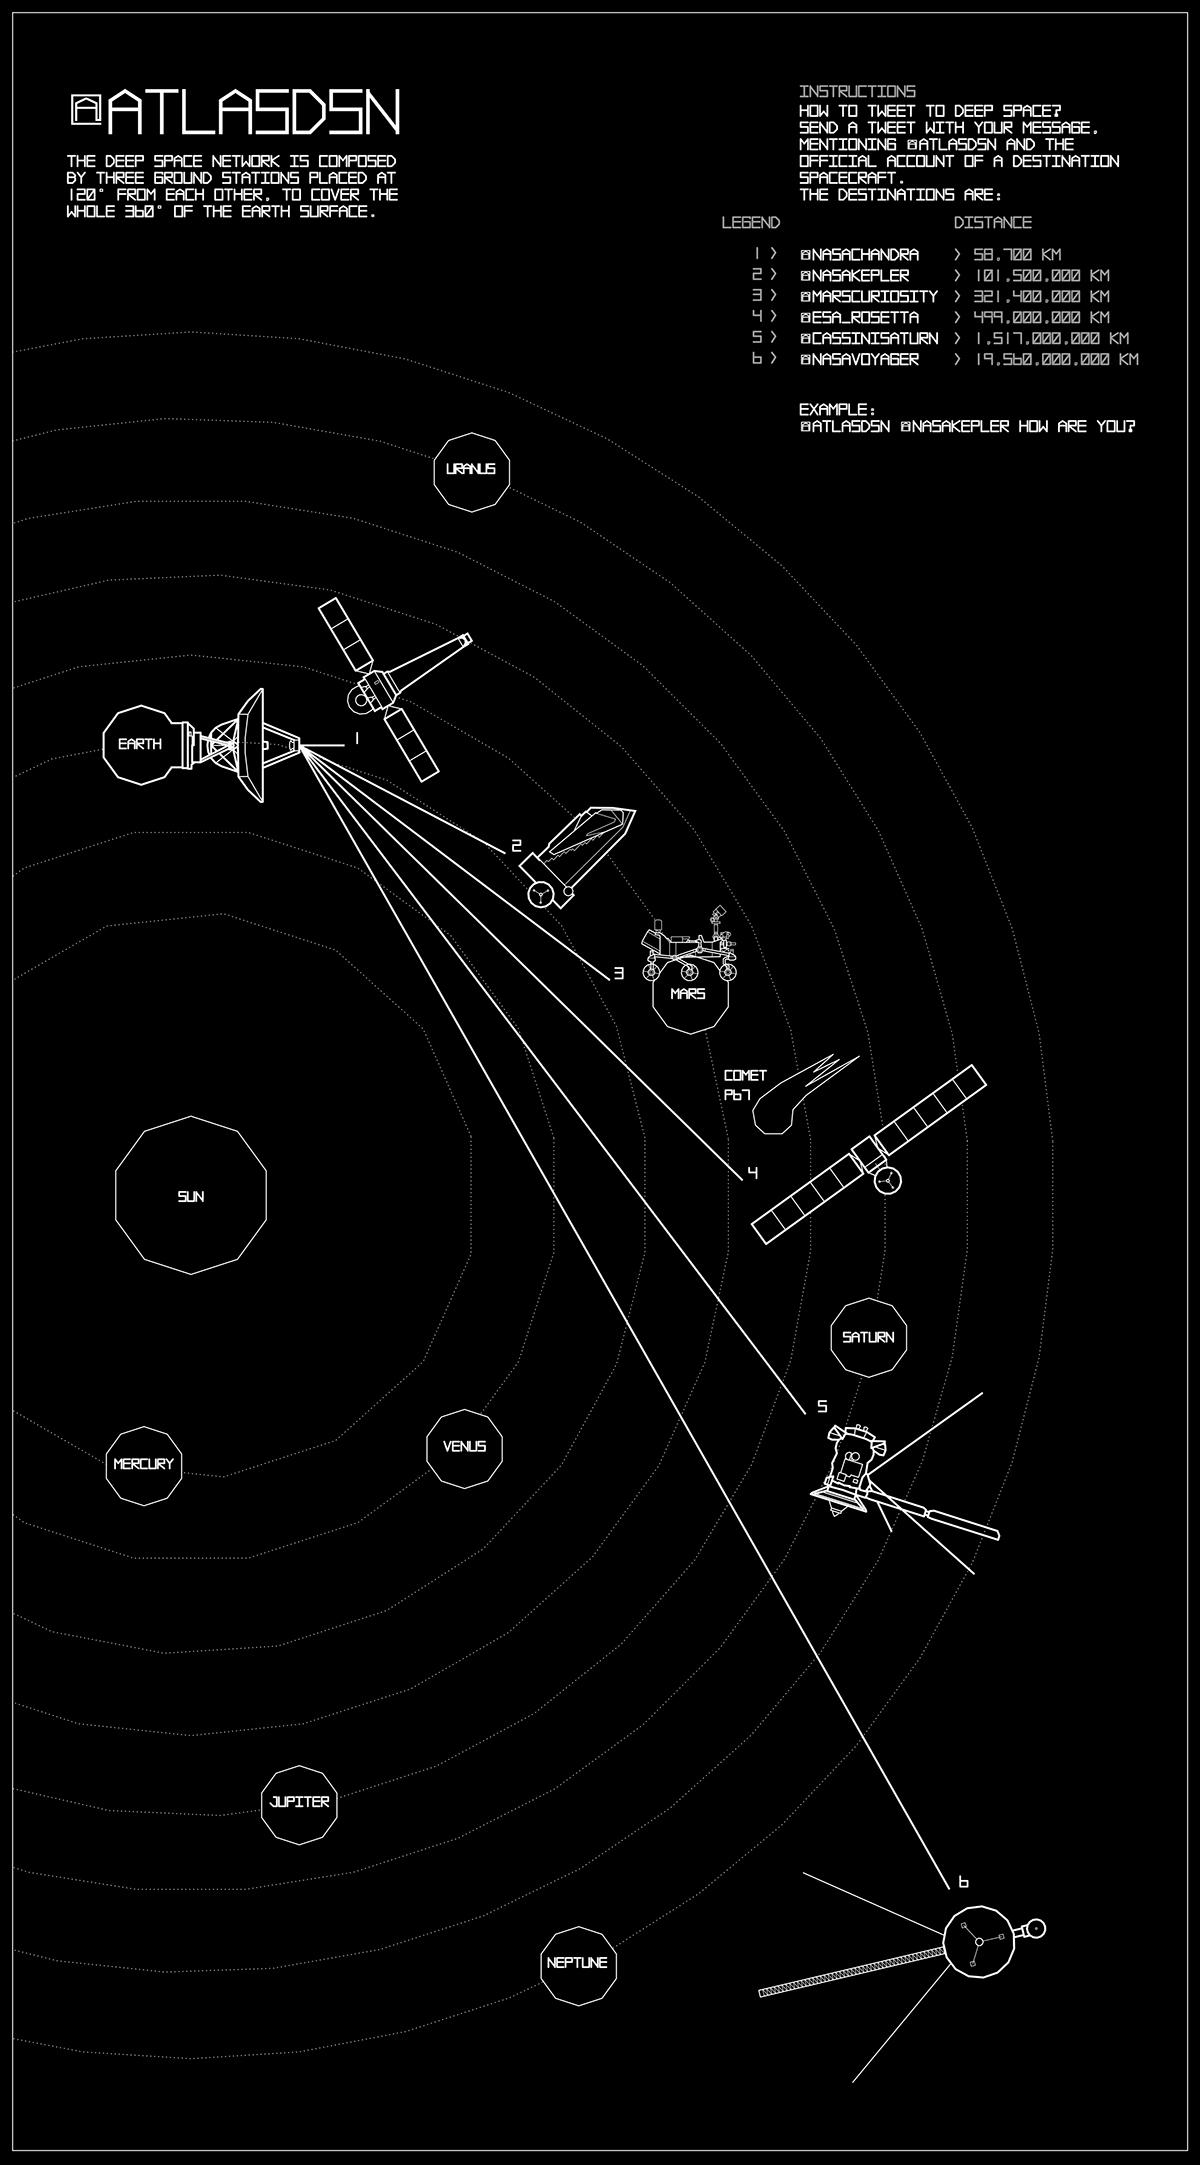 twitter nasa Deep Space Network interplanetary atlas Space probe satellite antennas